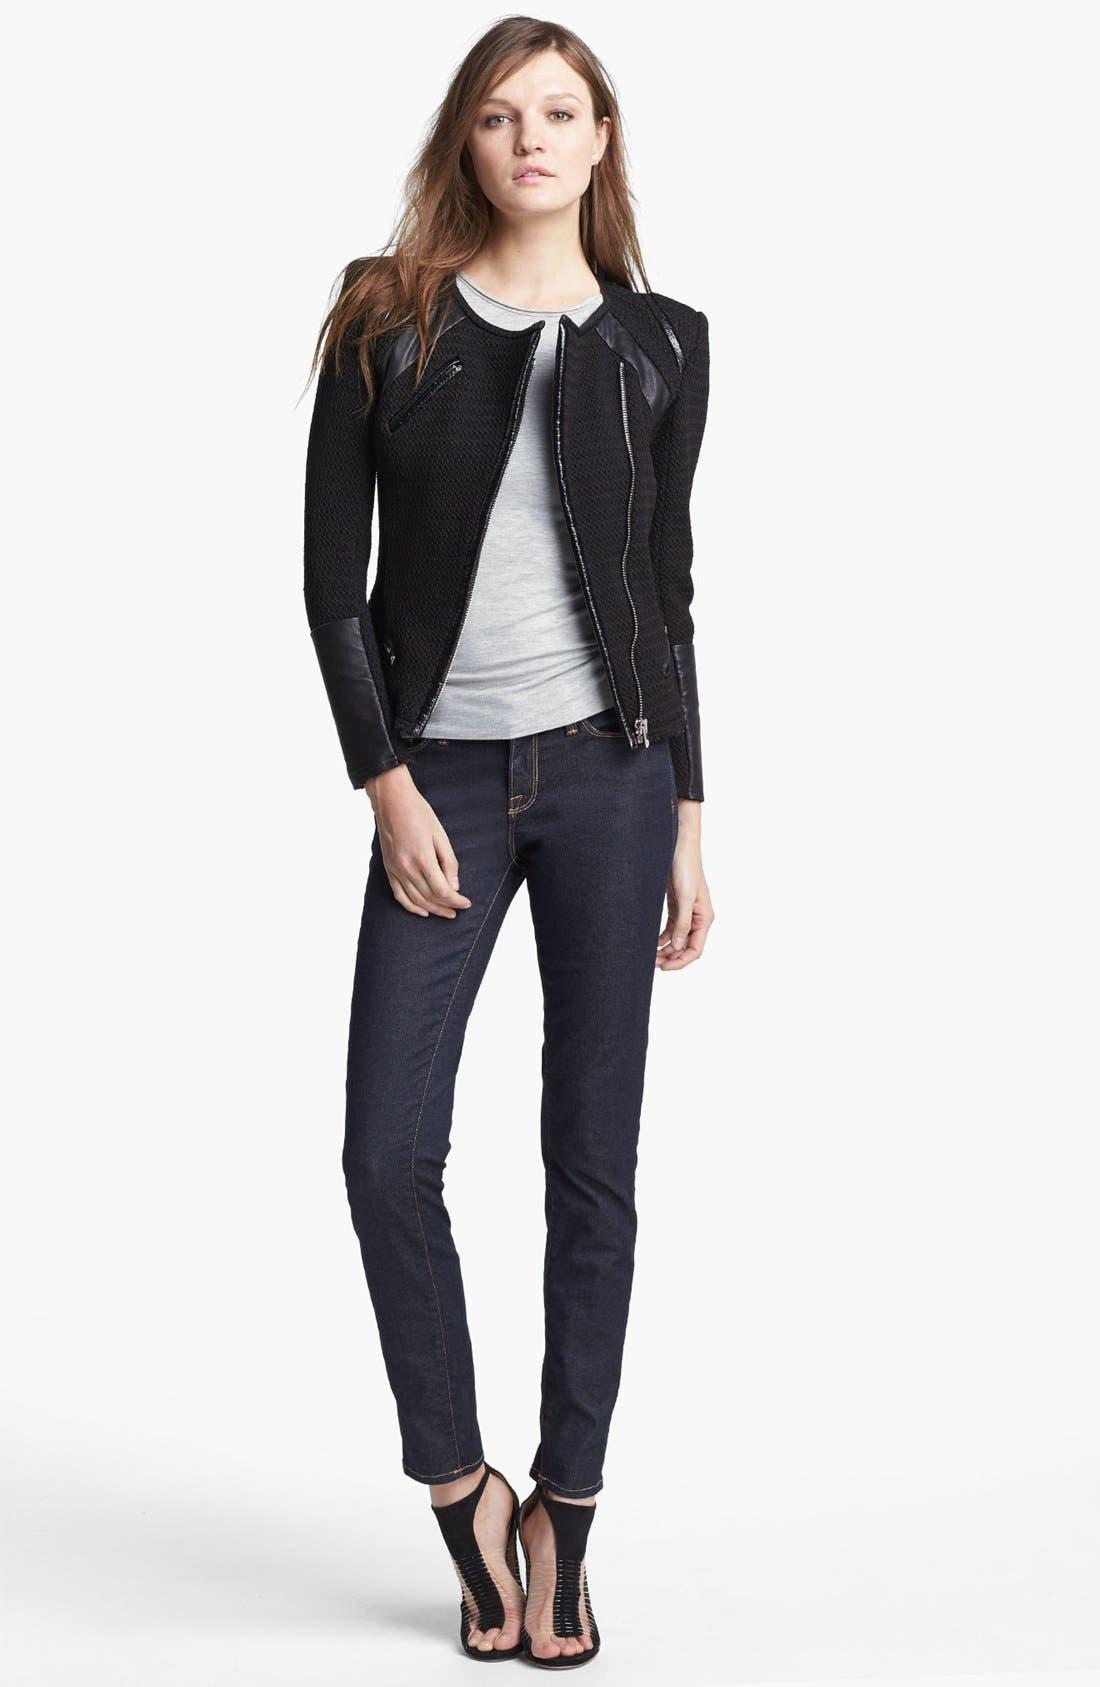 Main Image - IRO 'Risley' Asymmetrical Leather Trim Jacket